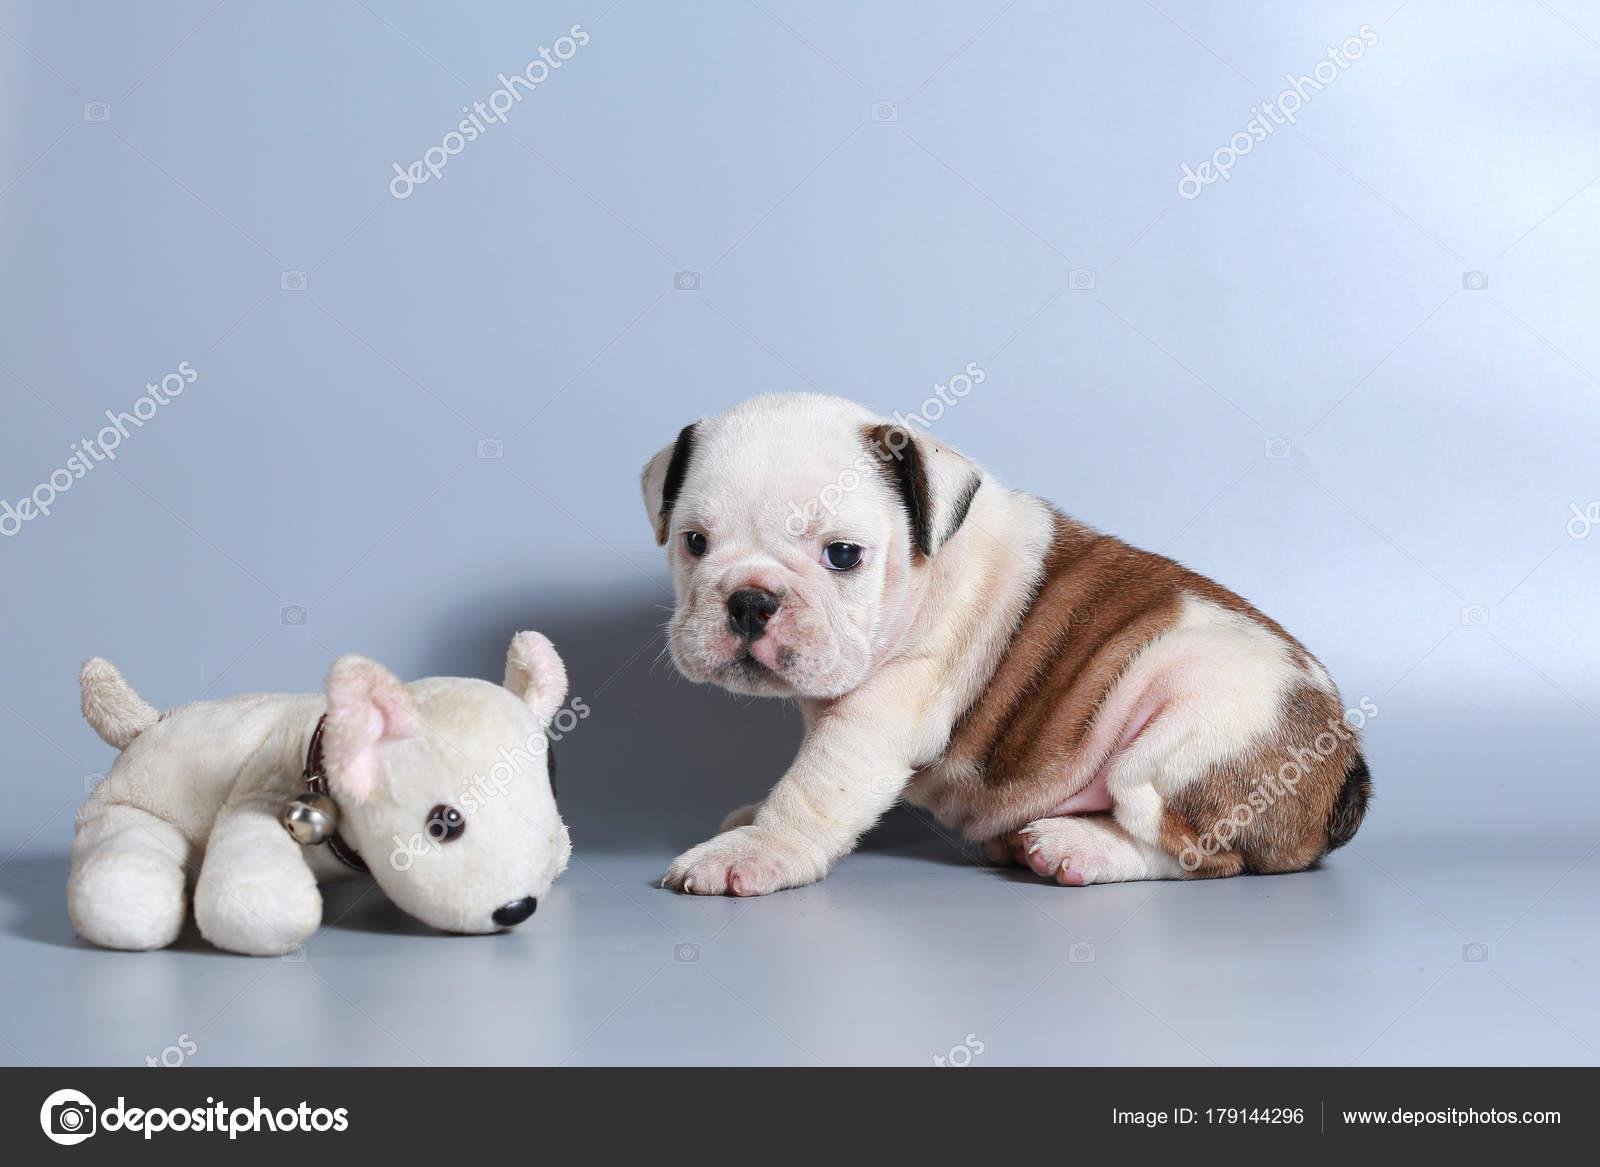 Month Purebred English Bulldog Puppy Gray Screen Stock Photo C S Thanawathreborn Gmail Com 179144296